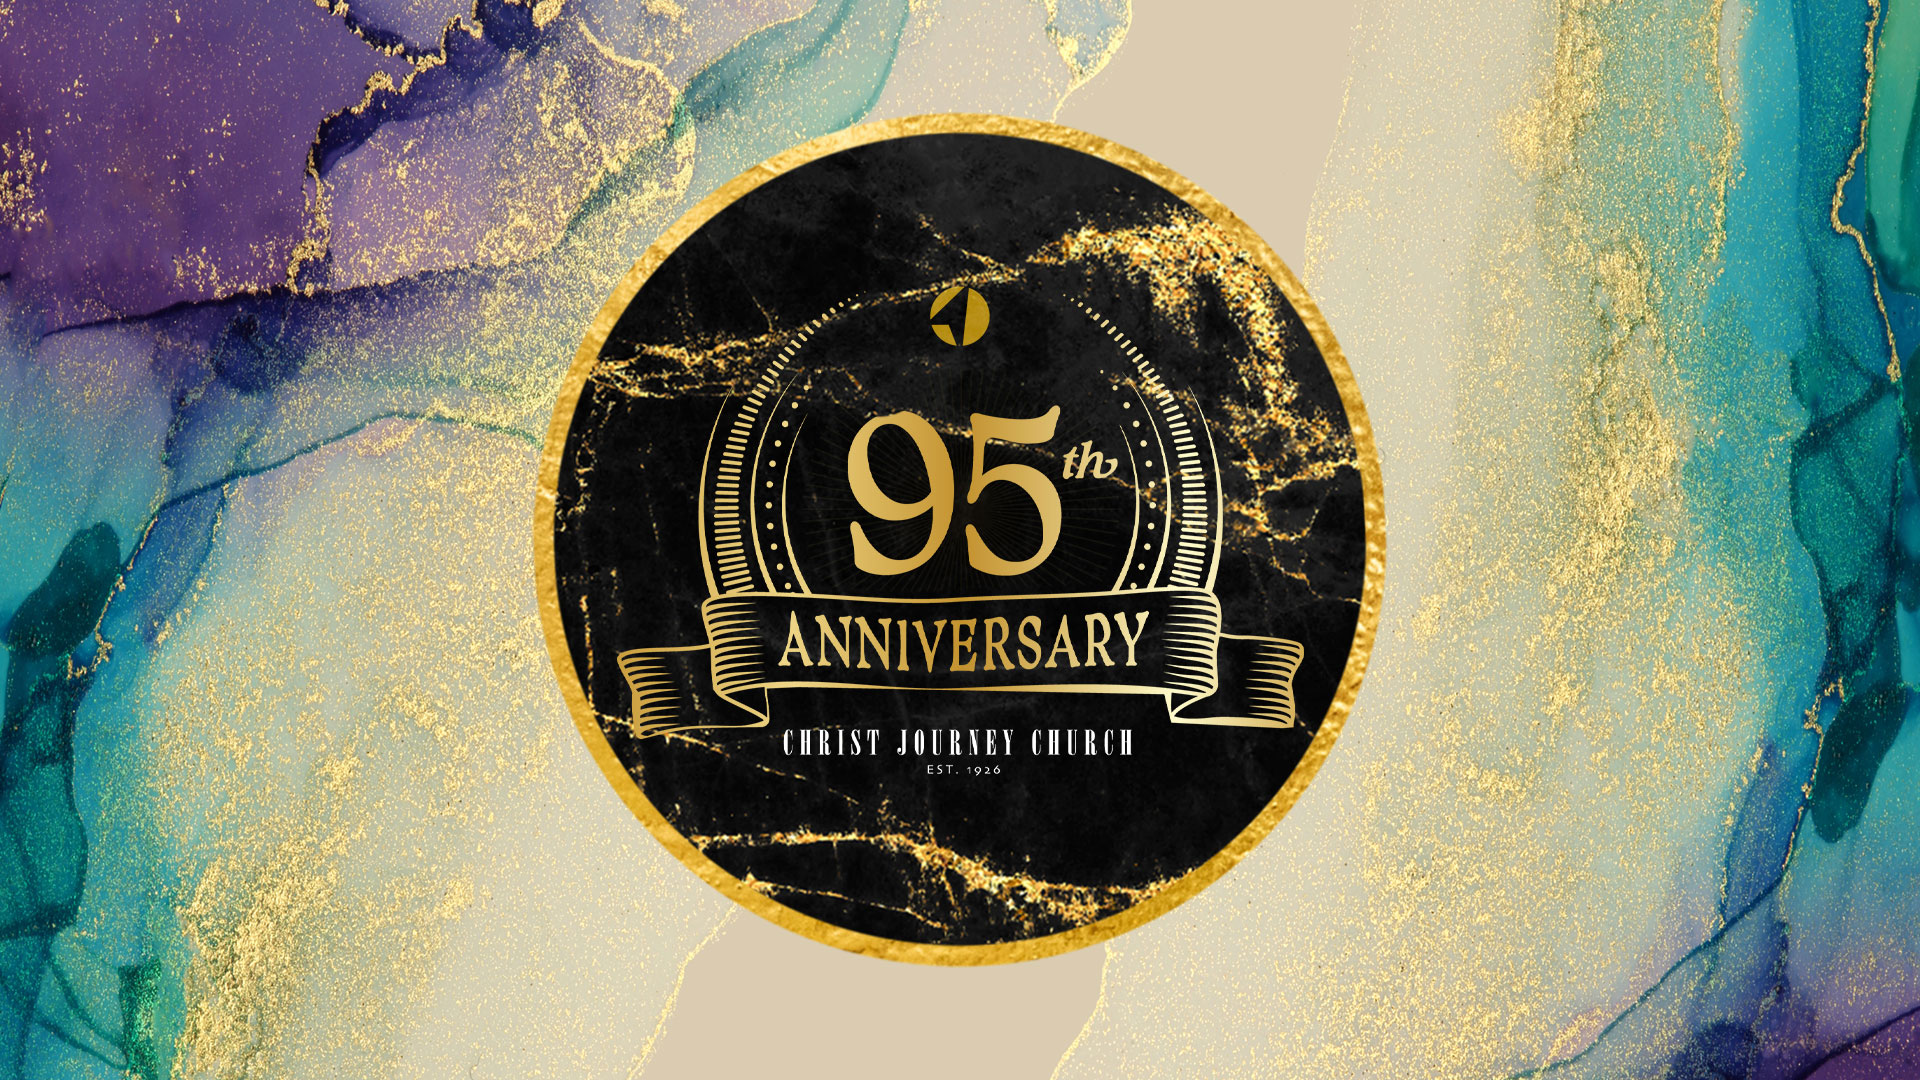 Christ-Journey-Church-95th Anniversary App Thumbnail